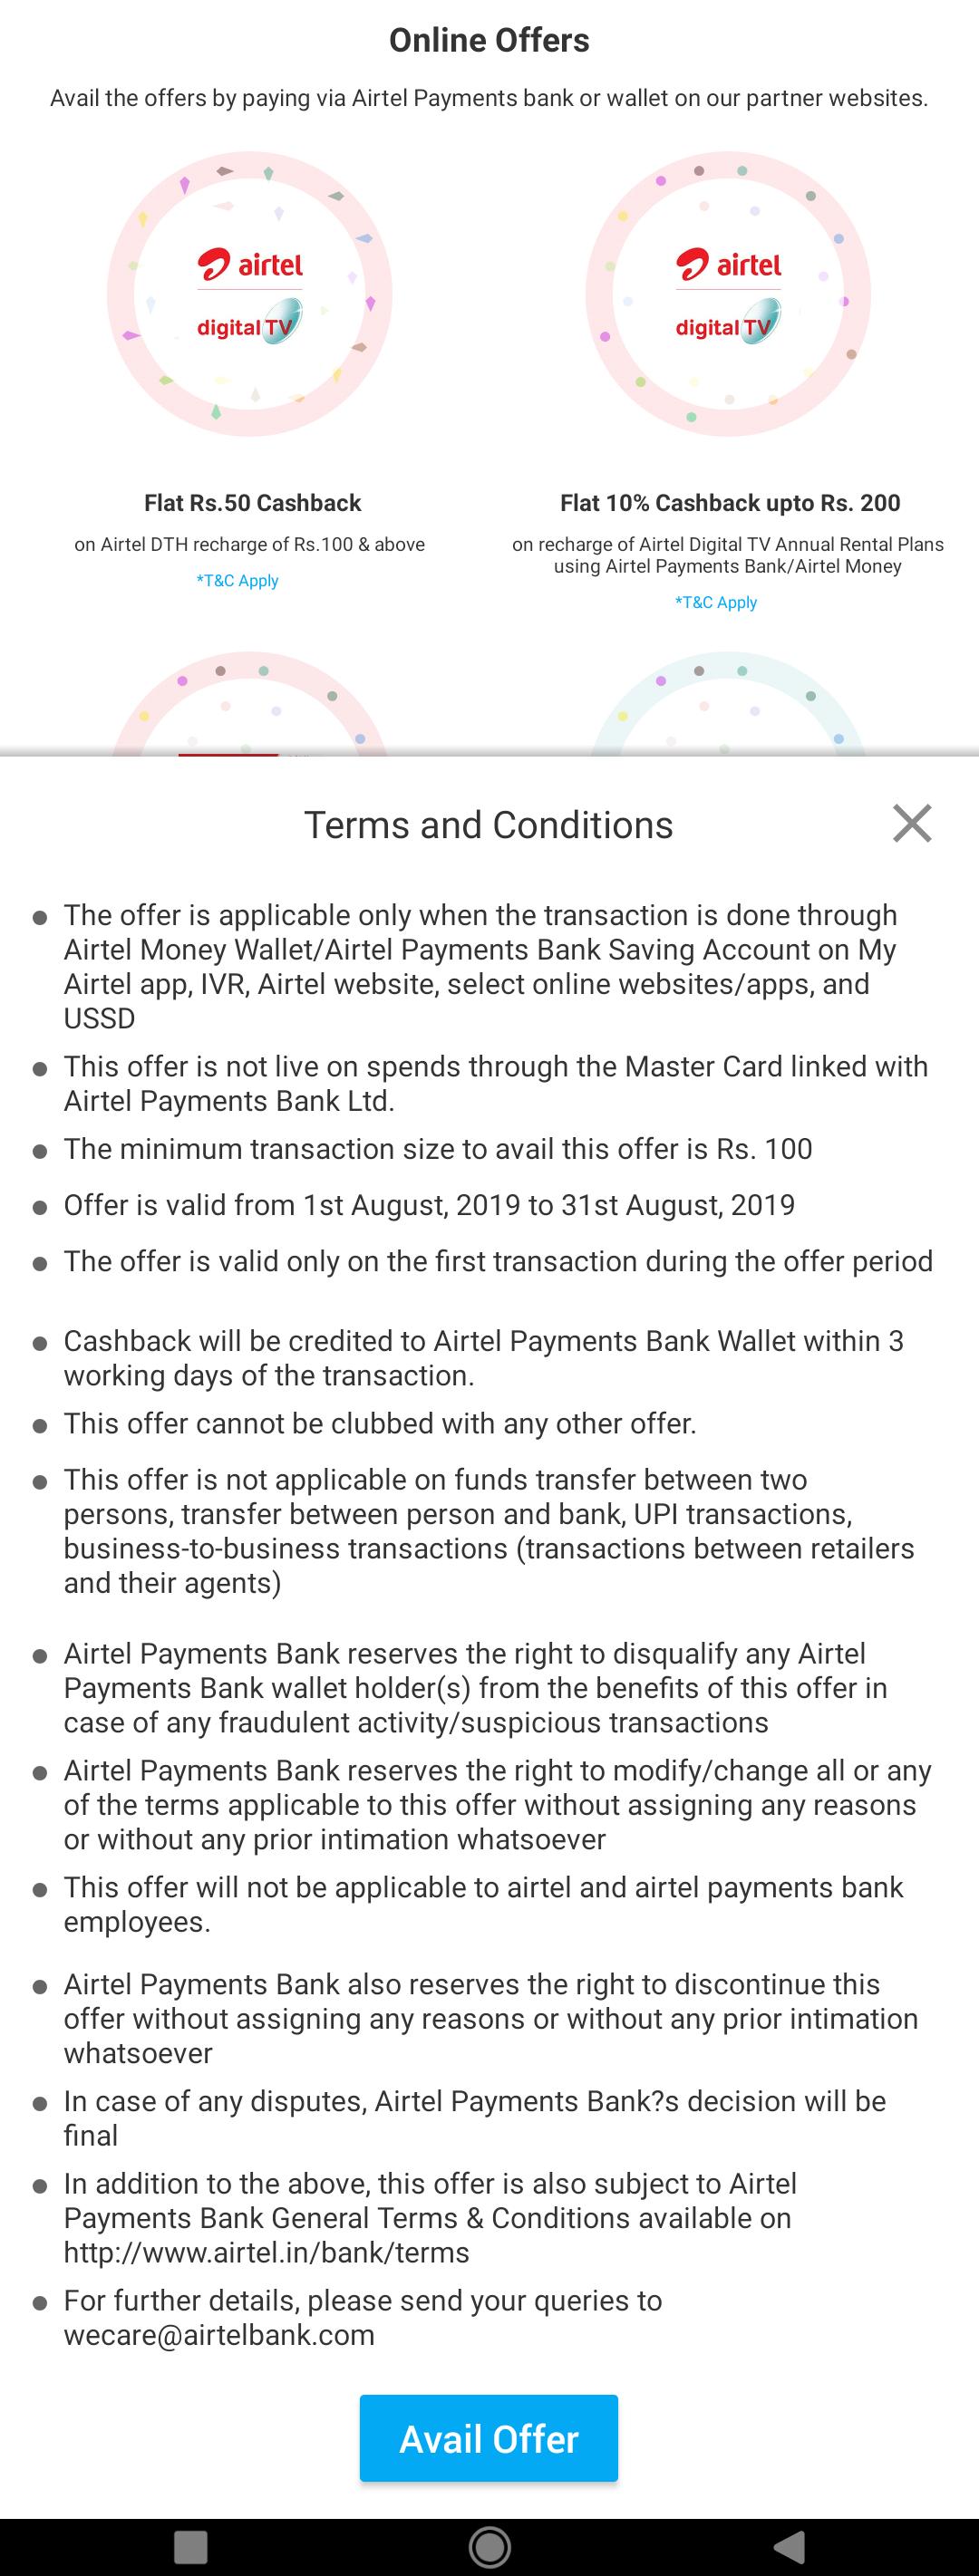 My Airtel App :- Flat 50₹ Cashback on Airtel DTH Recharge